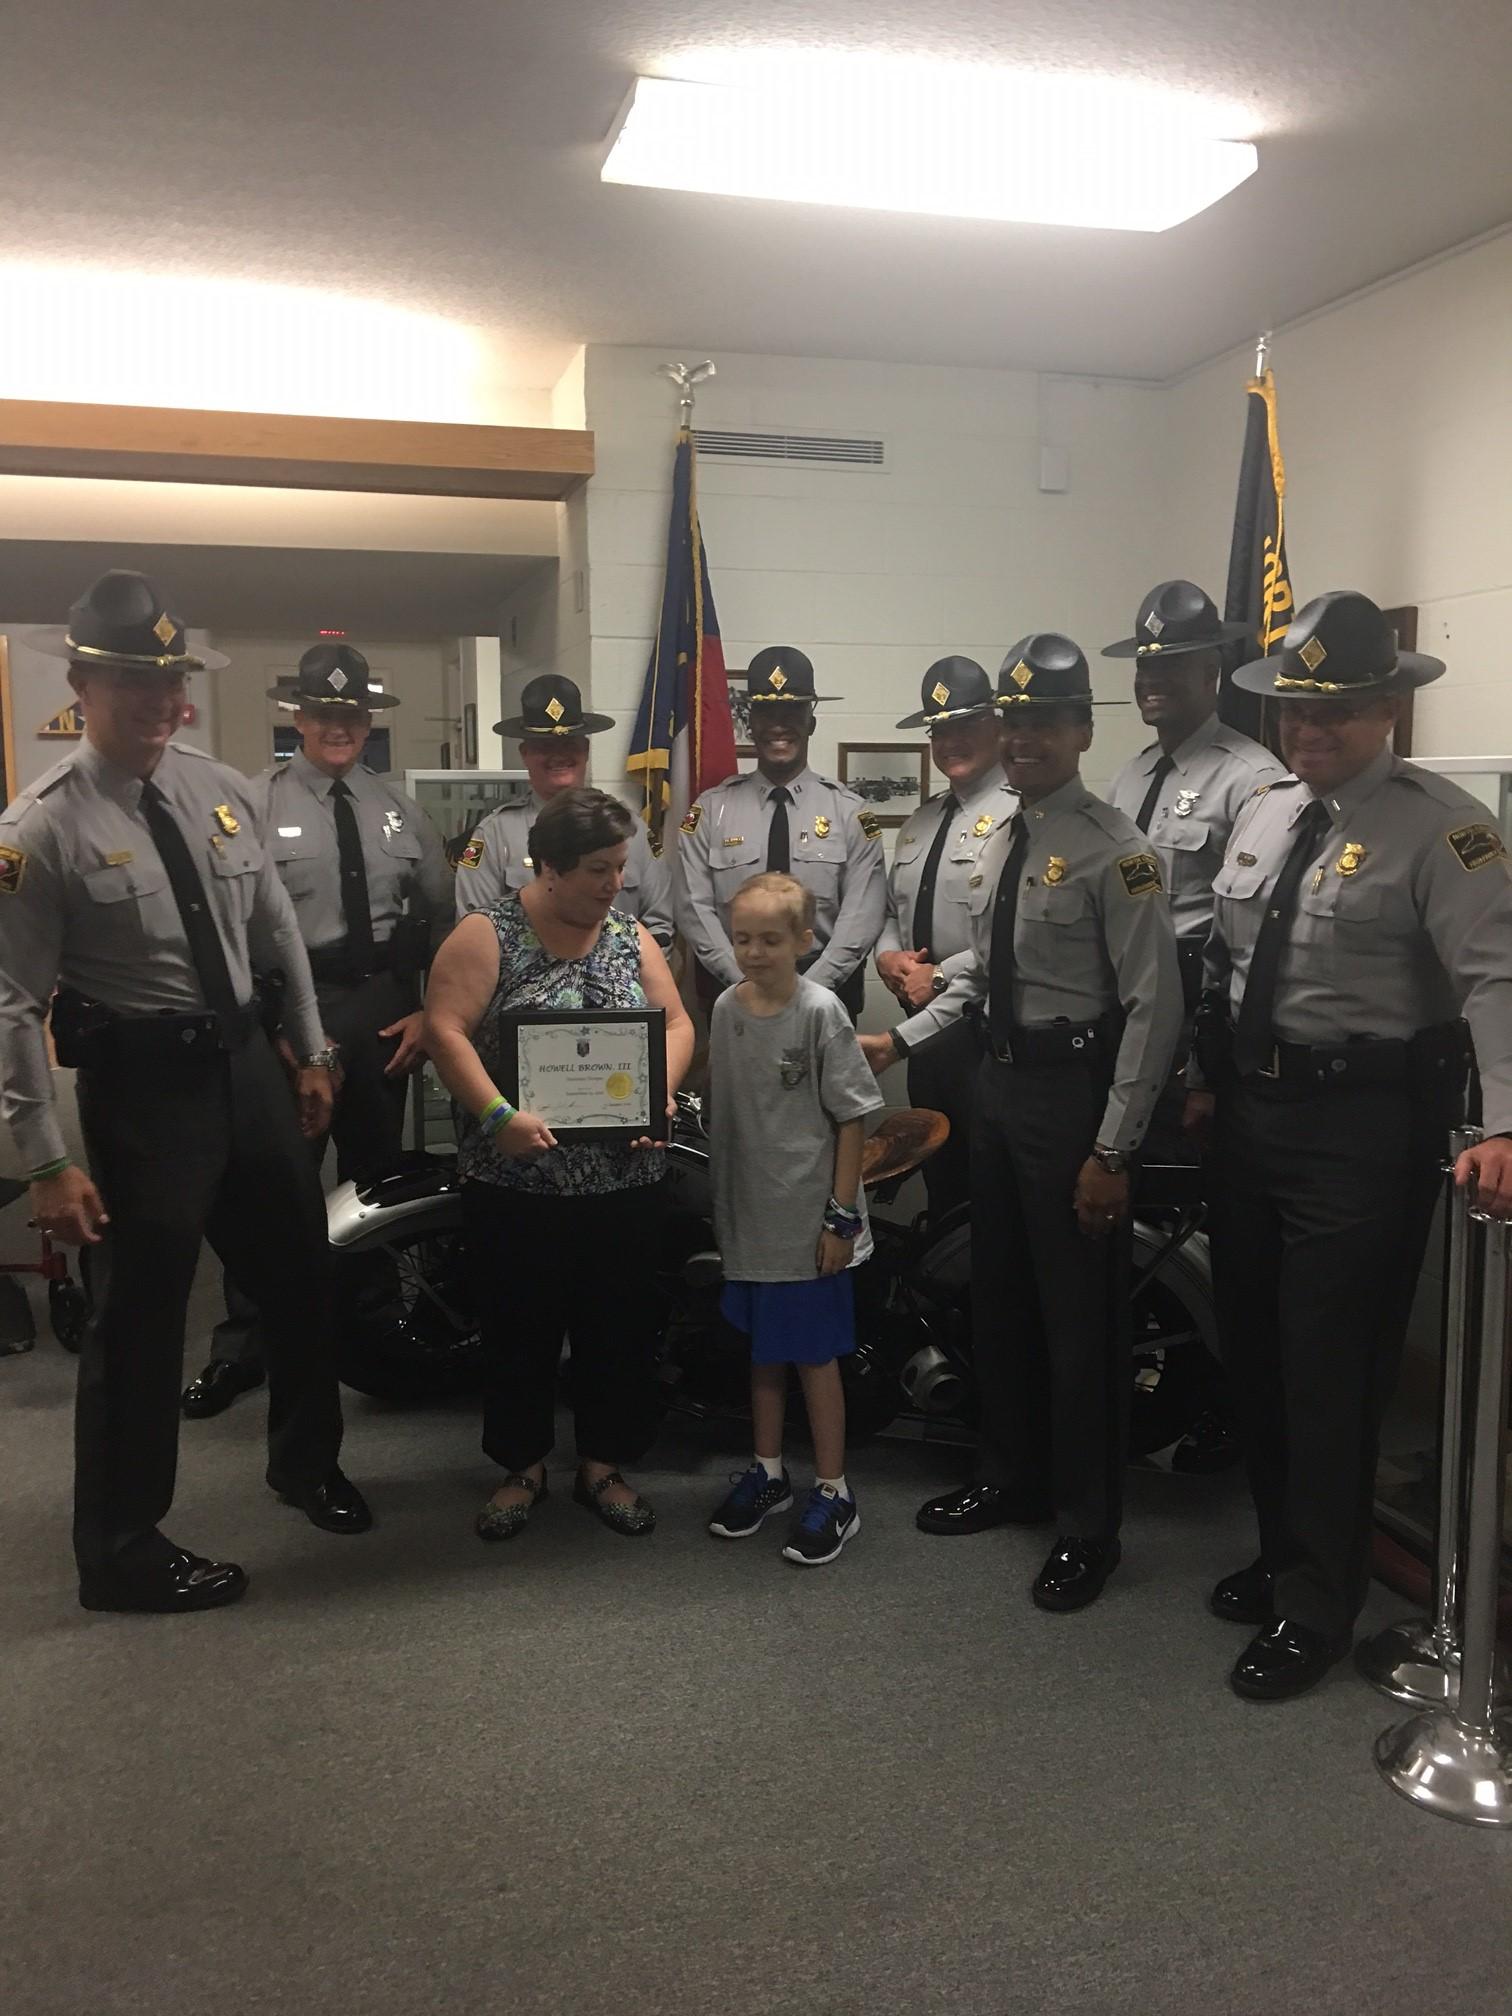 North Carolina State Highway Patrol Holds Promotional